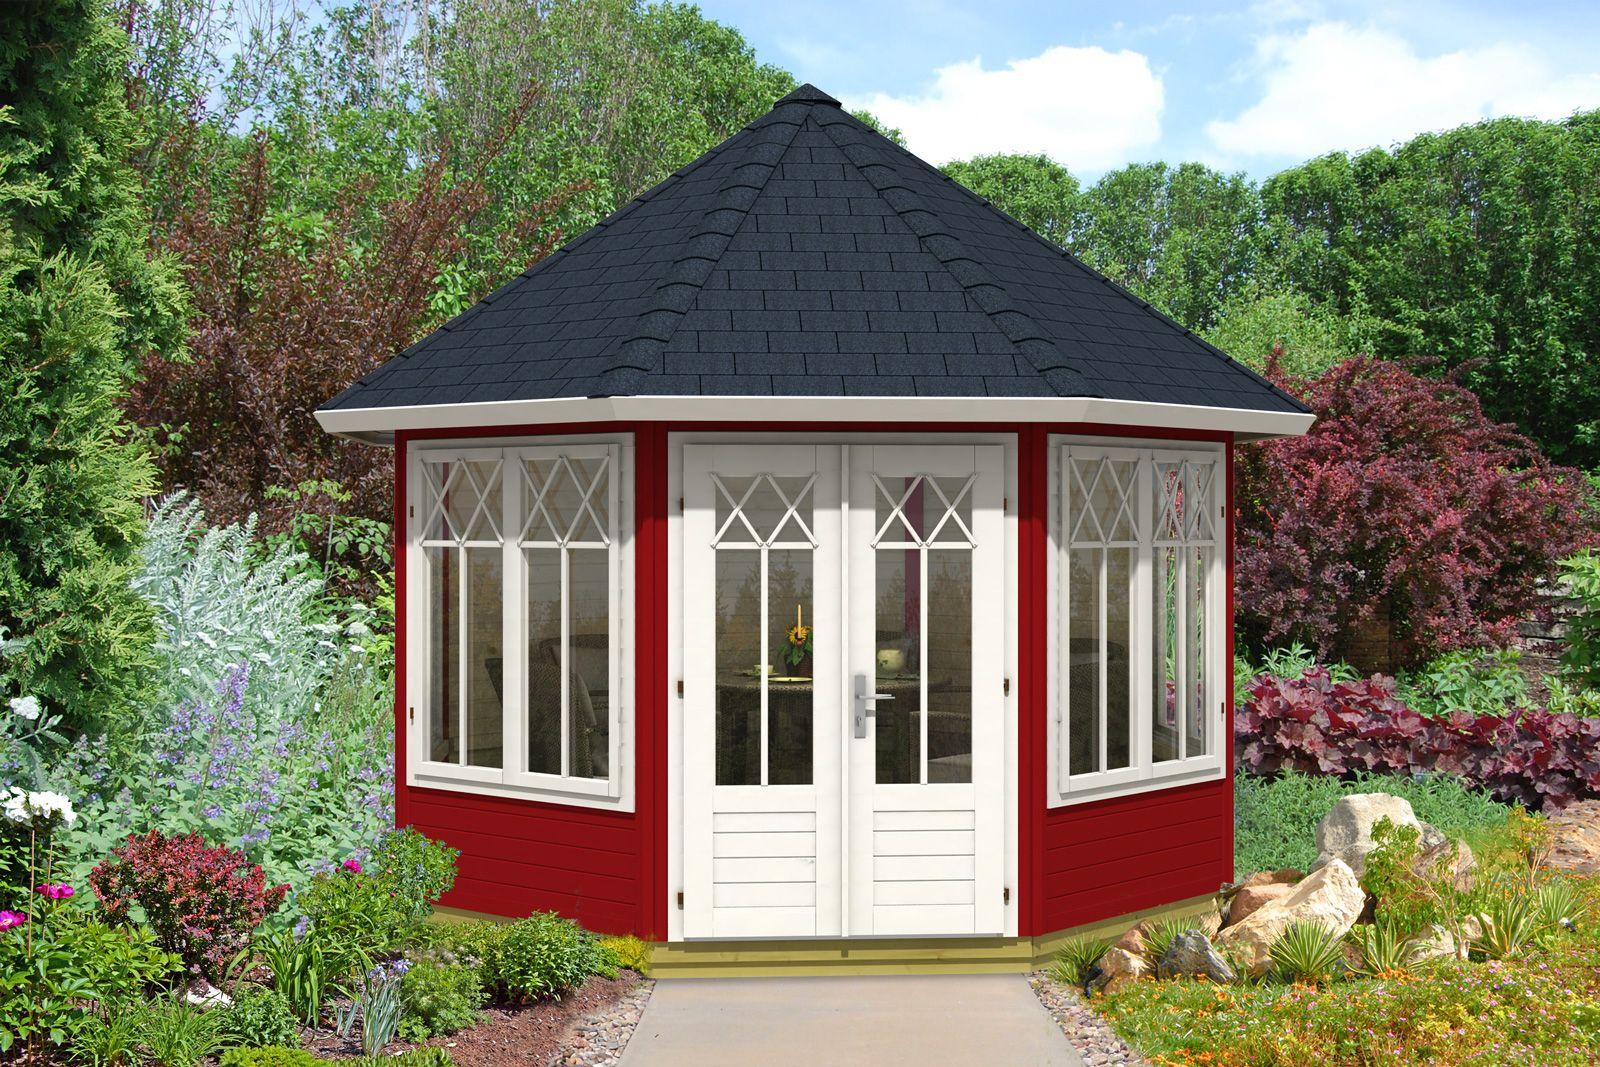 gartenpavillon in schwedenrot und wei gartenpavillons. Black Bedroom Furniture Sets. Home Design Ideas